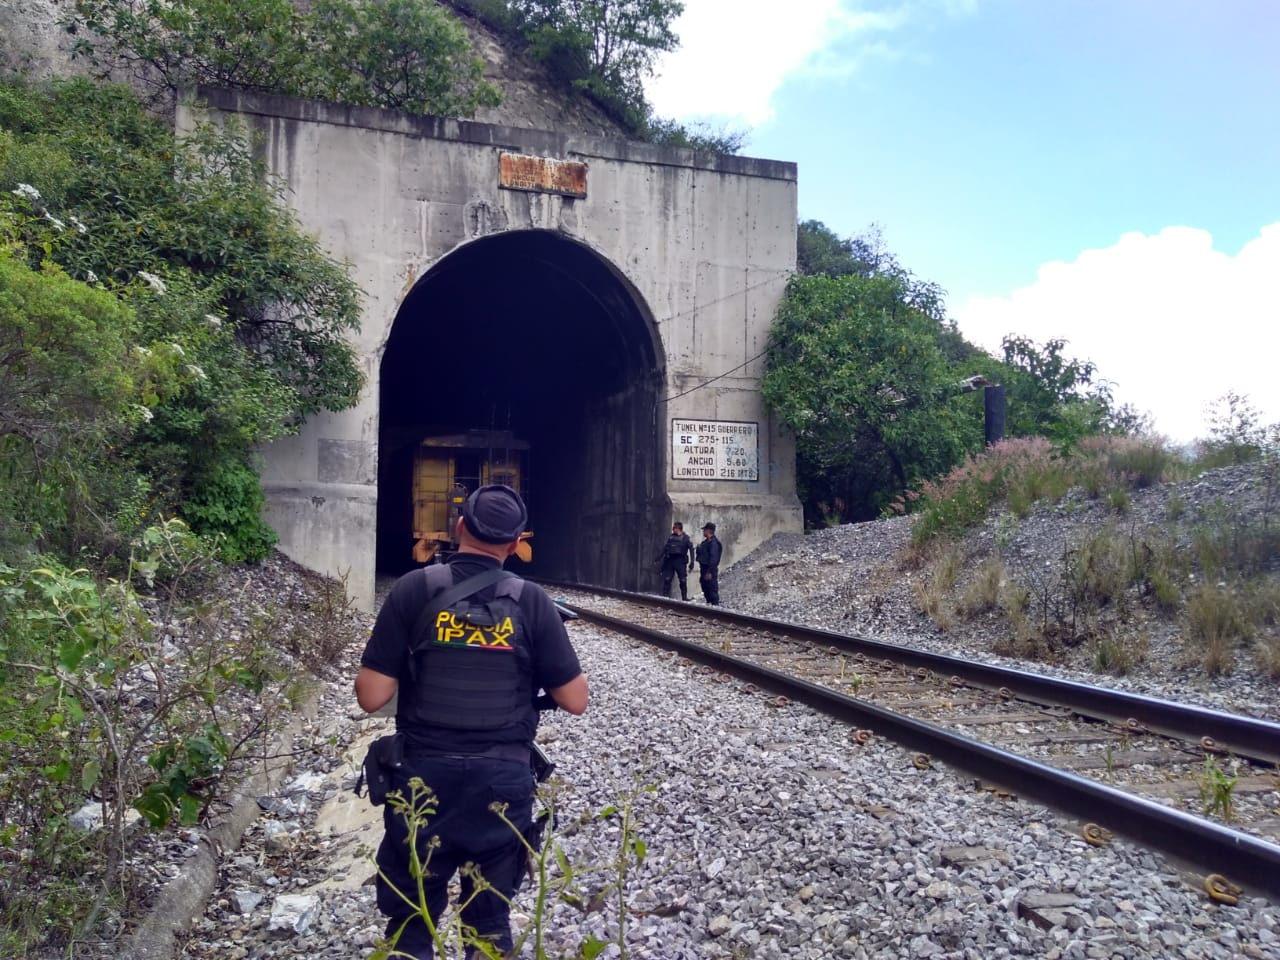 IPAX Orizaba inhibe nuevo sistema de robo al tren